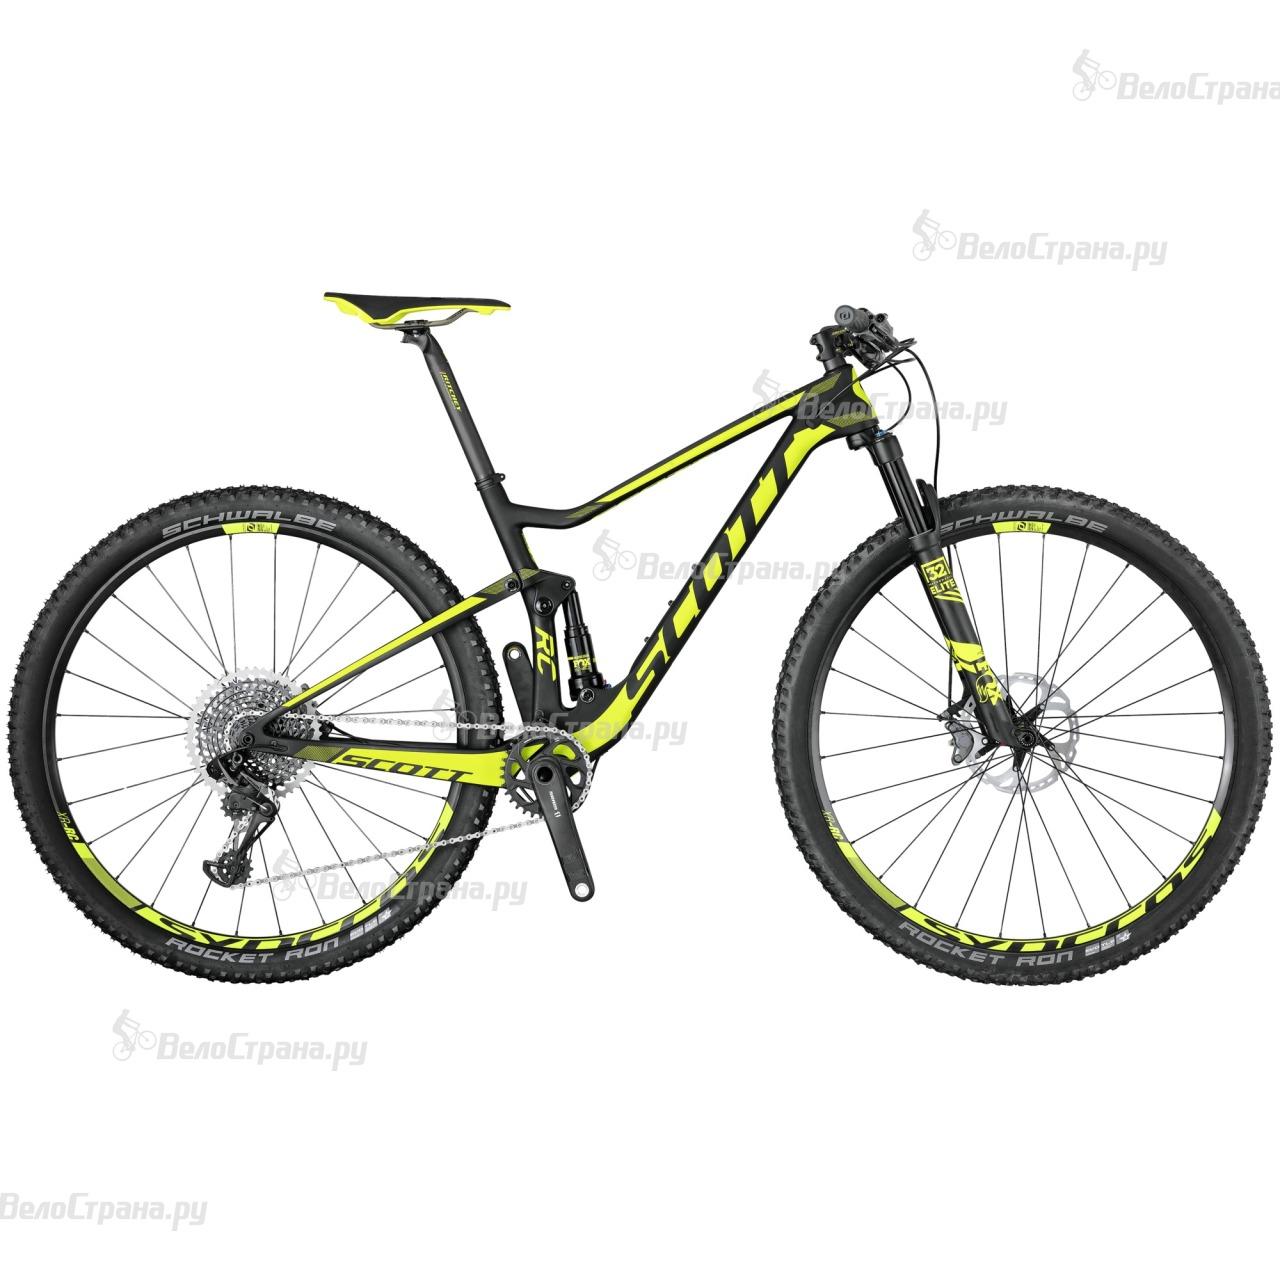 Велосипед Scott Spark RC 900 World Cup (2017) велосипед scott spark 700 rc 2015